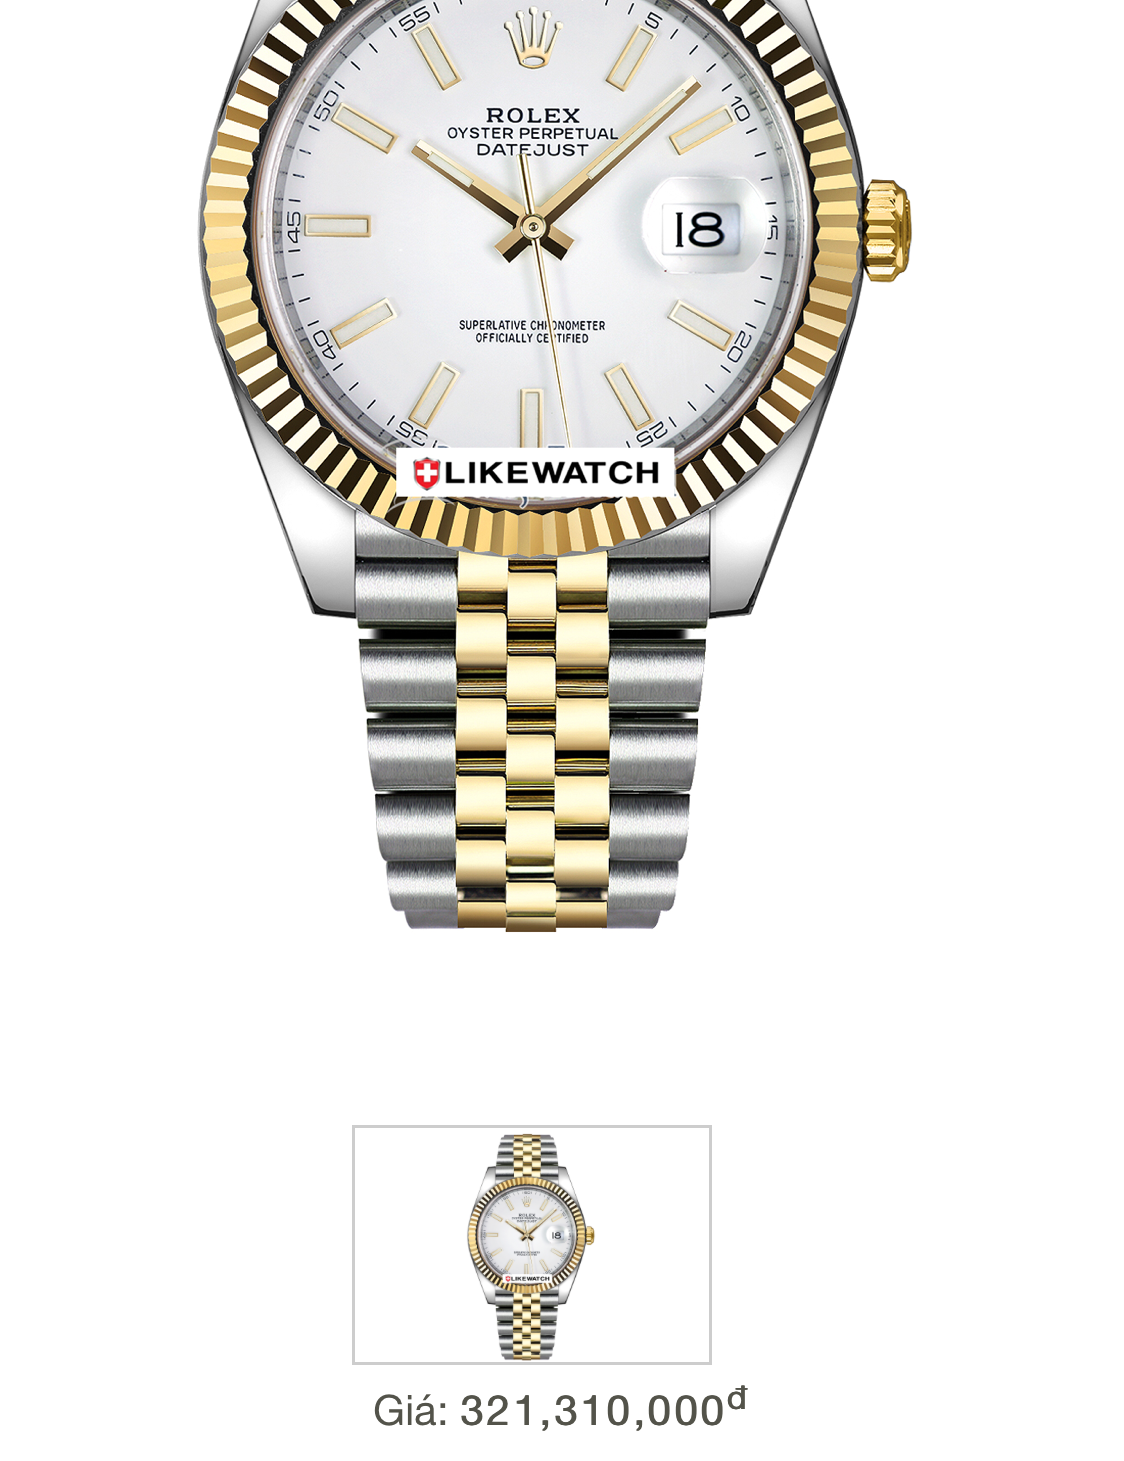 Rolex 126333 mặt vàng tia demi vàng 18k size 41mm